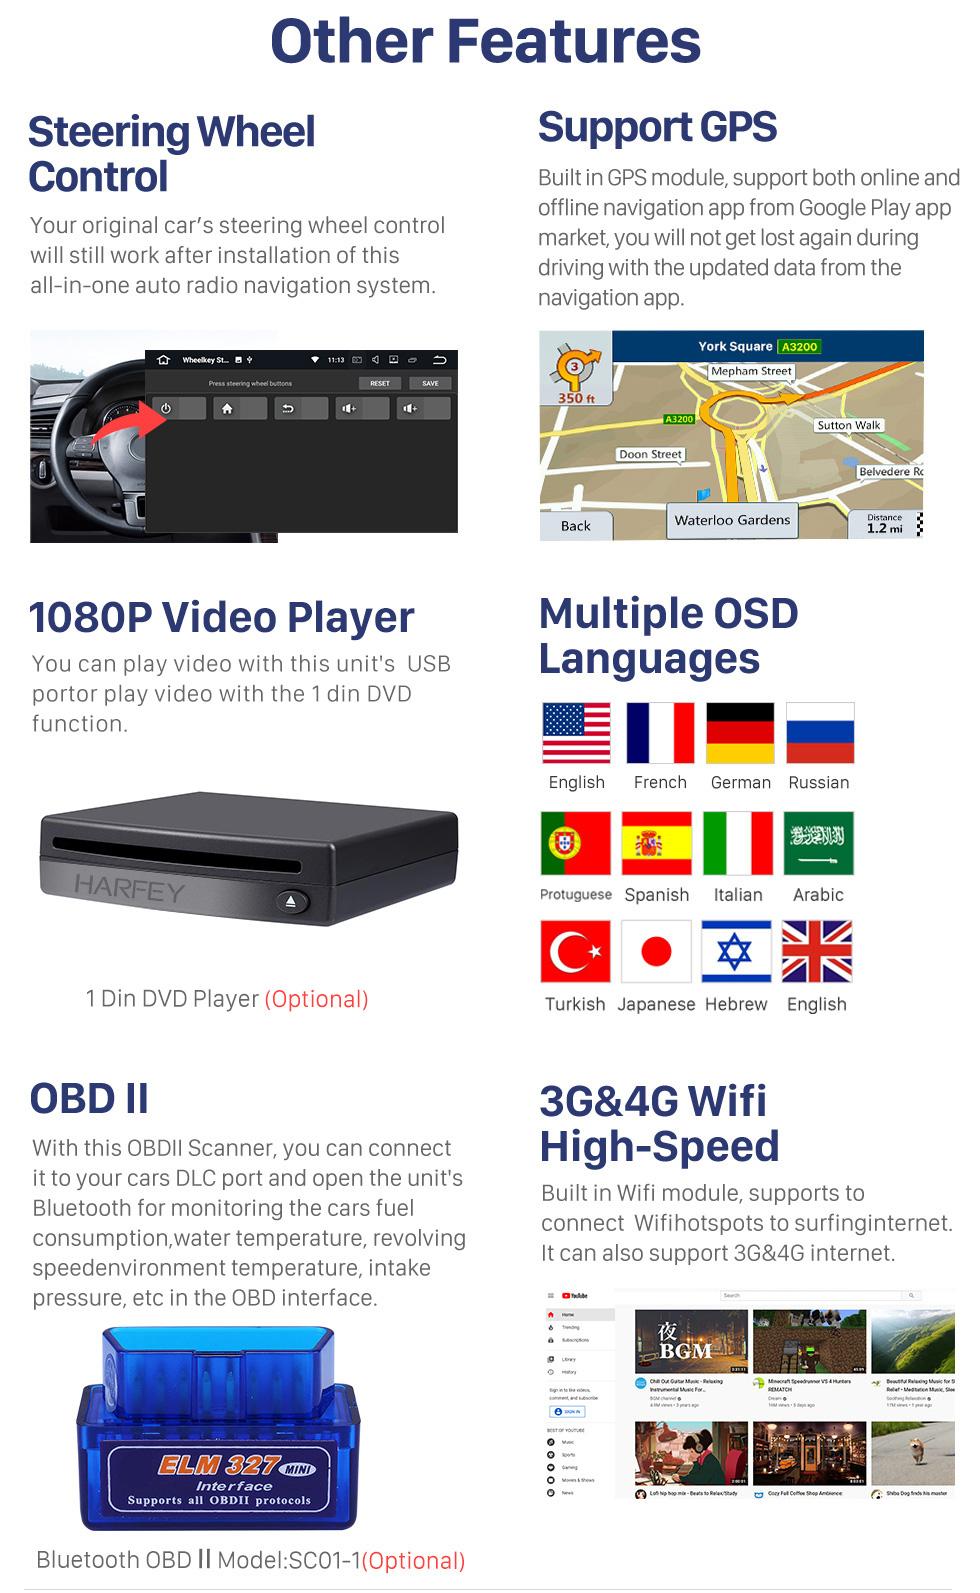 Seicane Écran tactile HD pour 2008-2014 2015 2016 Volvo XC60 Radio Android 10.0 9 pouces Navigation GPS Bluetooth WIFI Support Carplay DVR DAB +